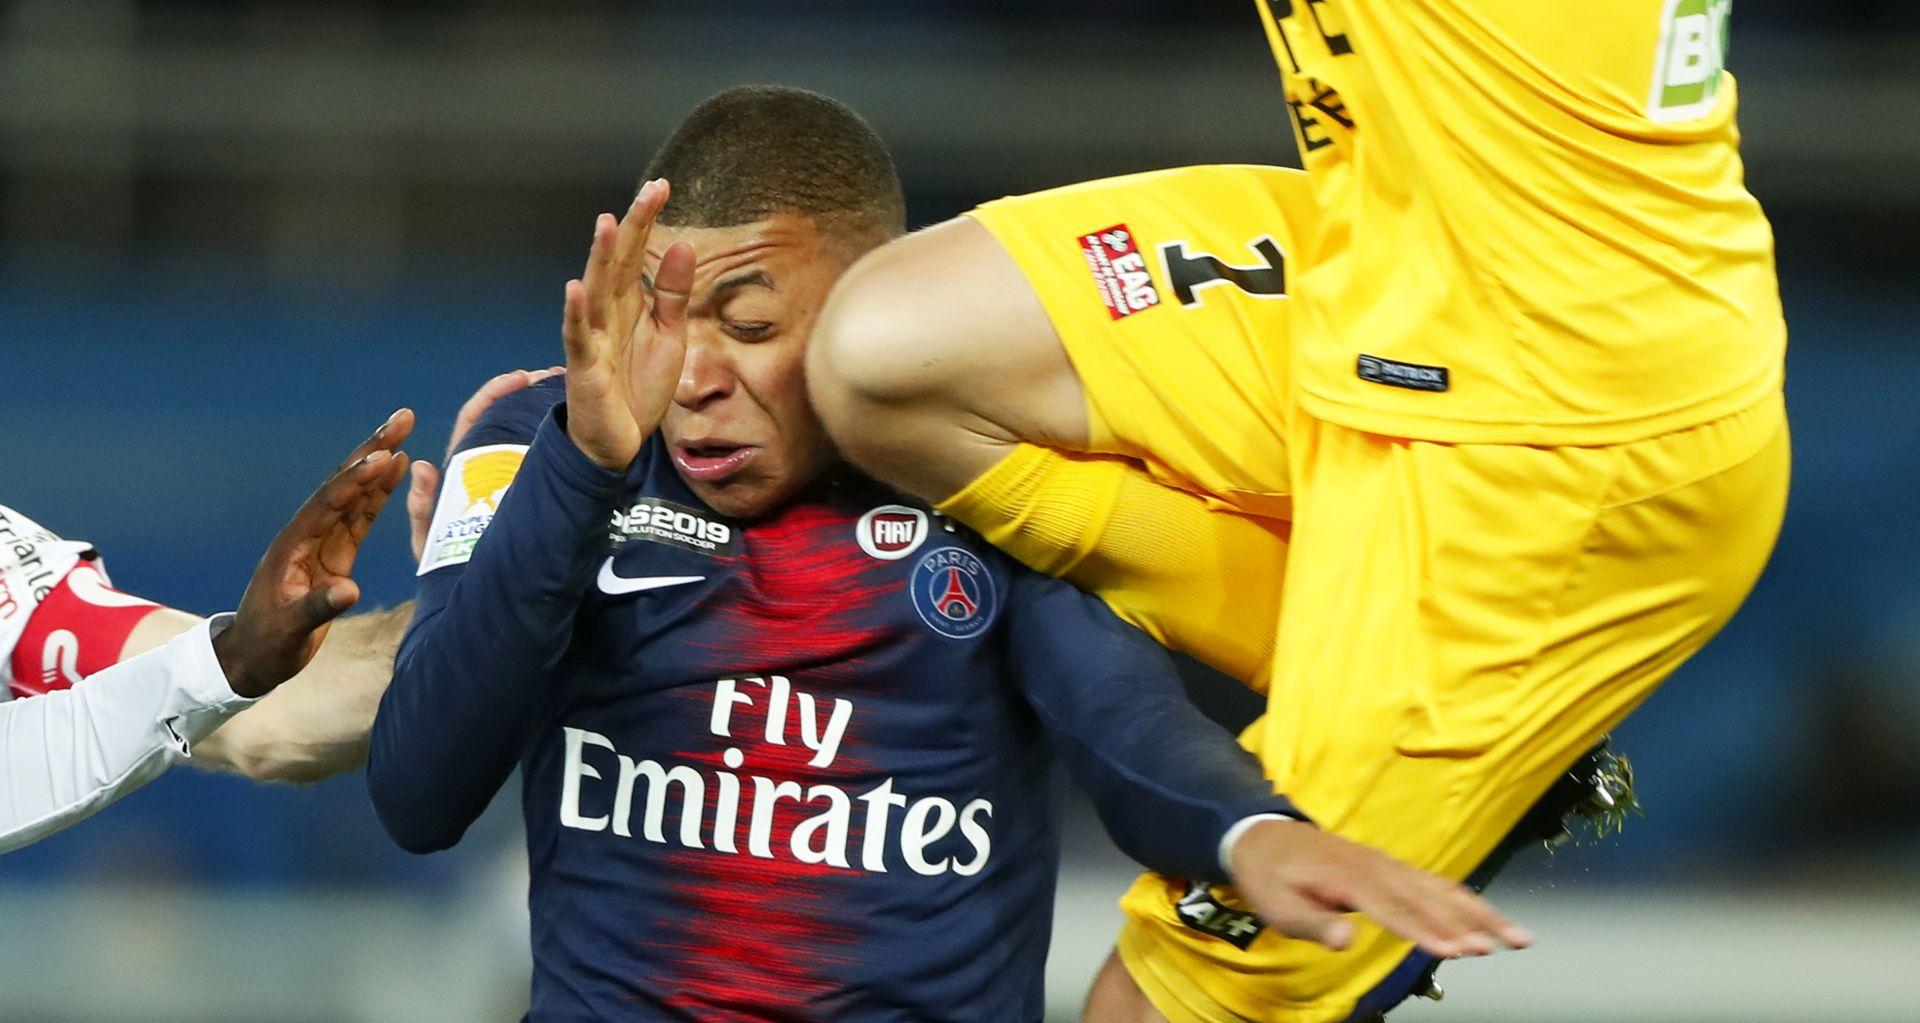 Guingamp izbacio PSG iz Liga kupa, Monaco prošao na penale